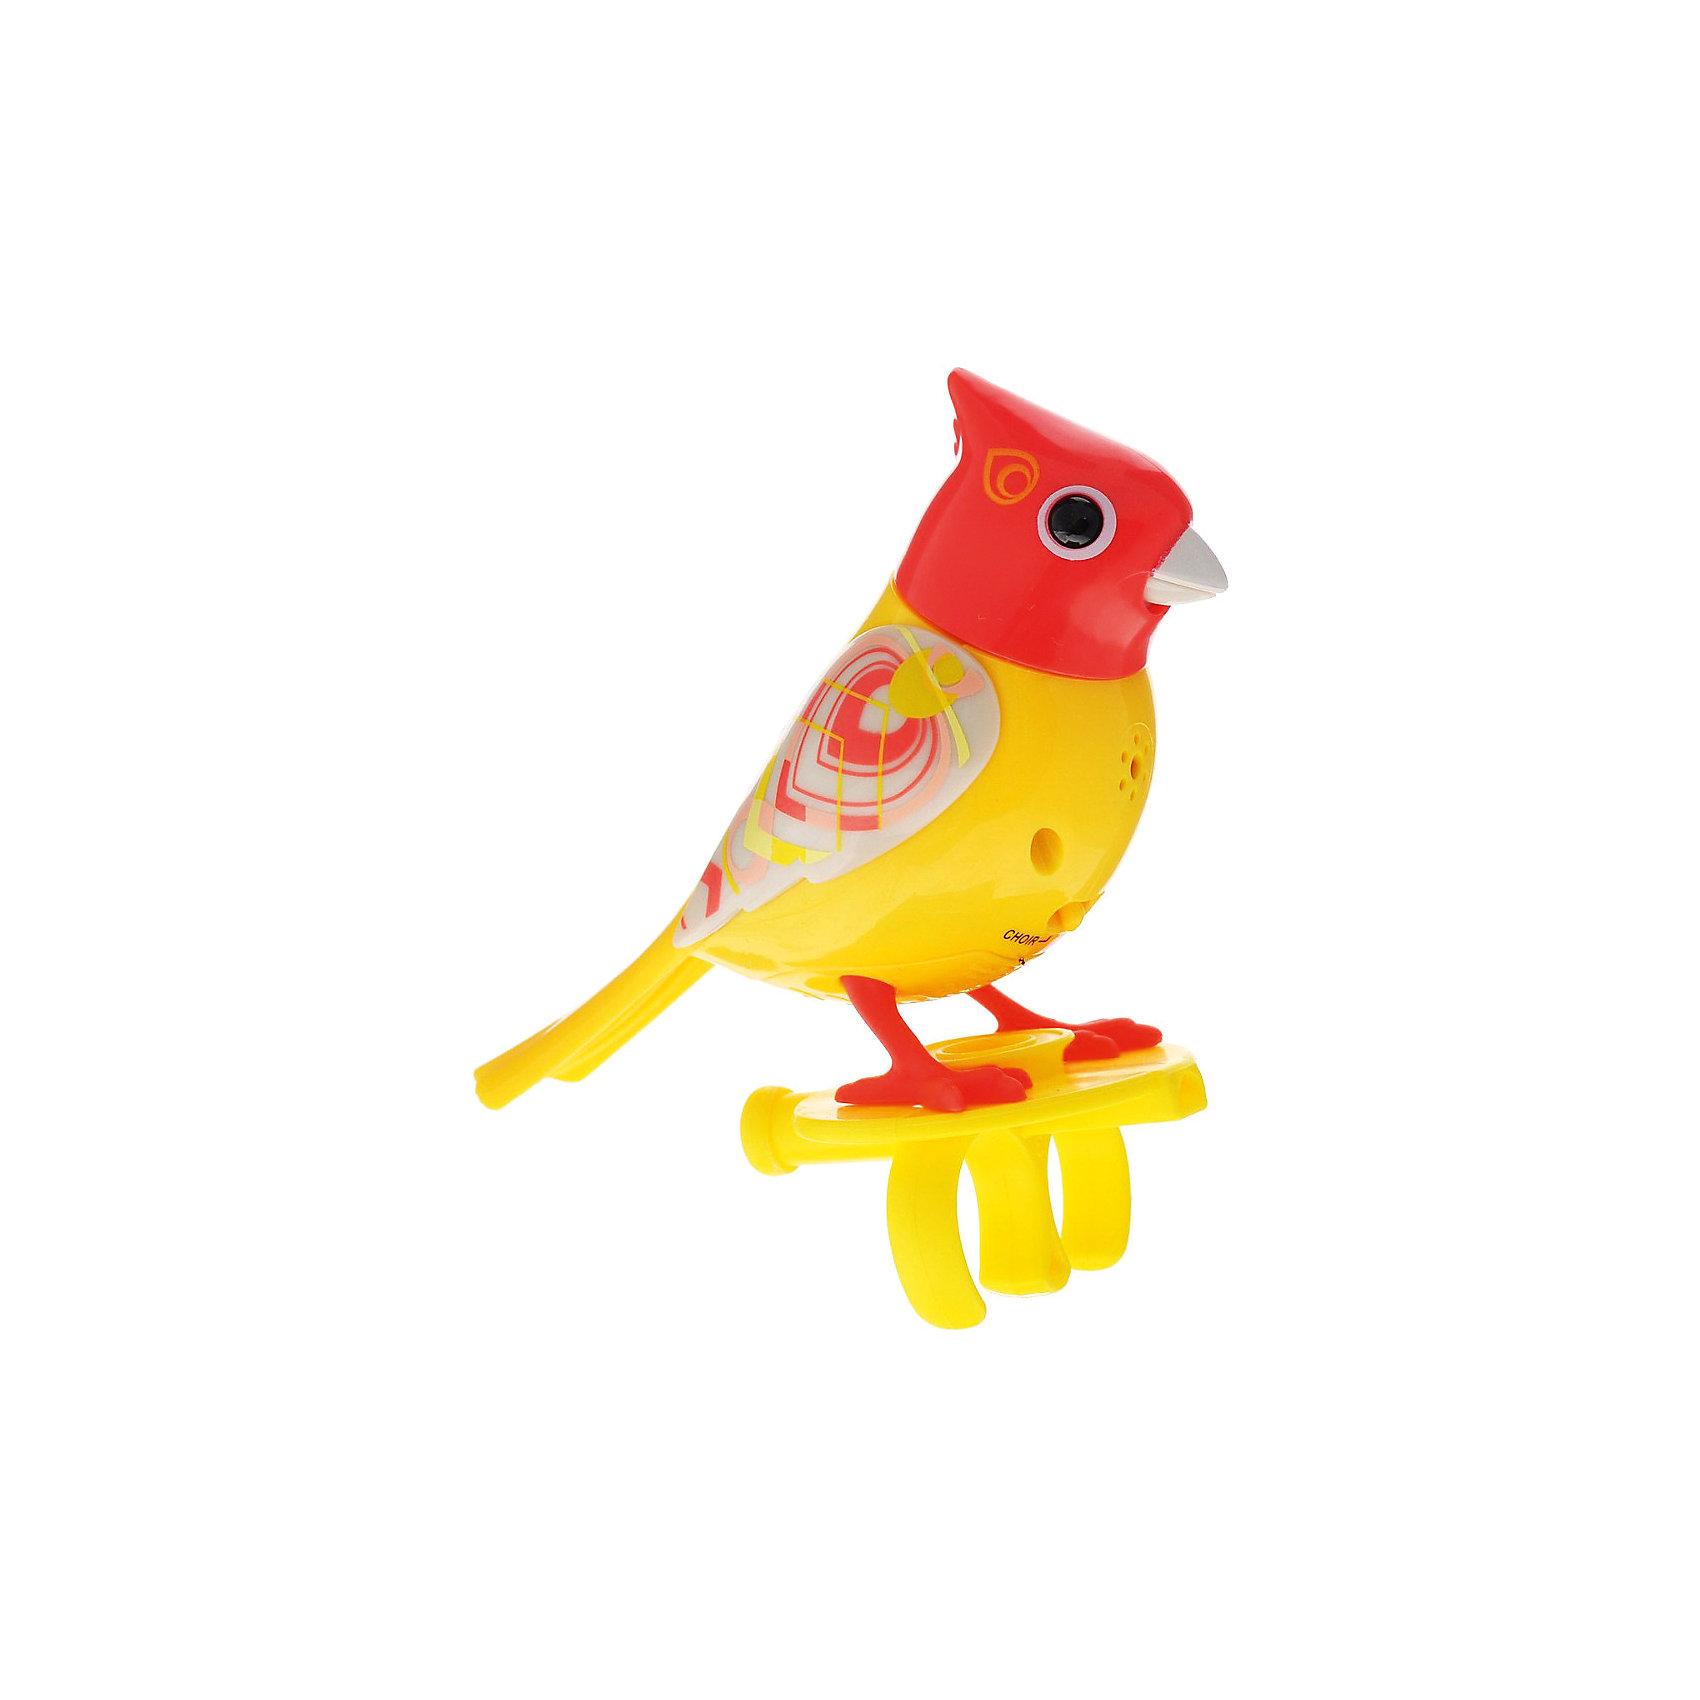 Silverlit Поющая птичка с кольцом, красная, DigiBirds silverlit золотая птичка с кольцом